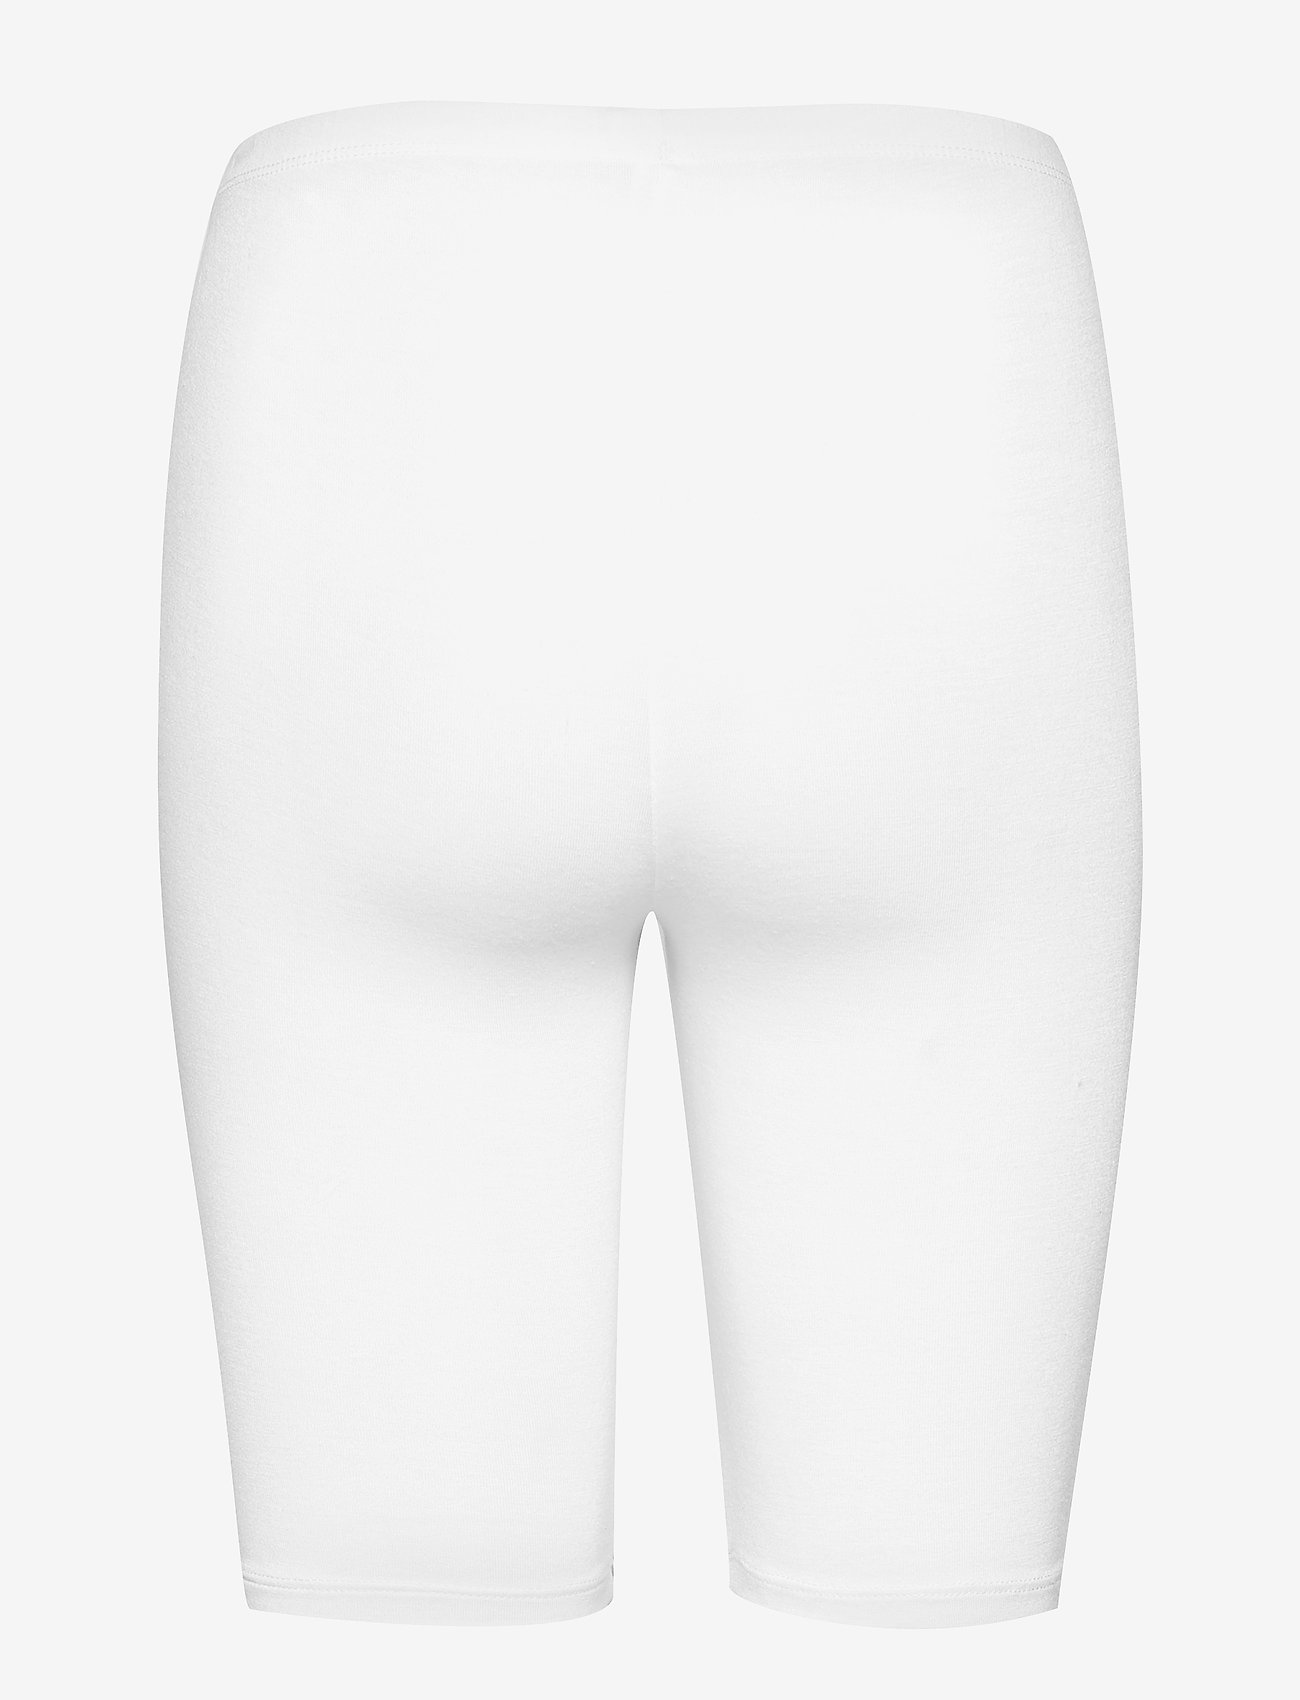 Decoy - DECOY shorts viscose stretch - bottoms - white - 1